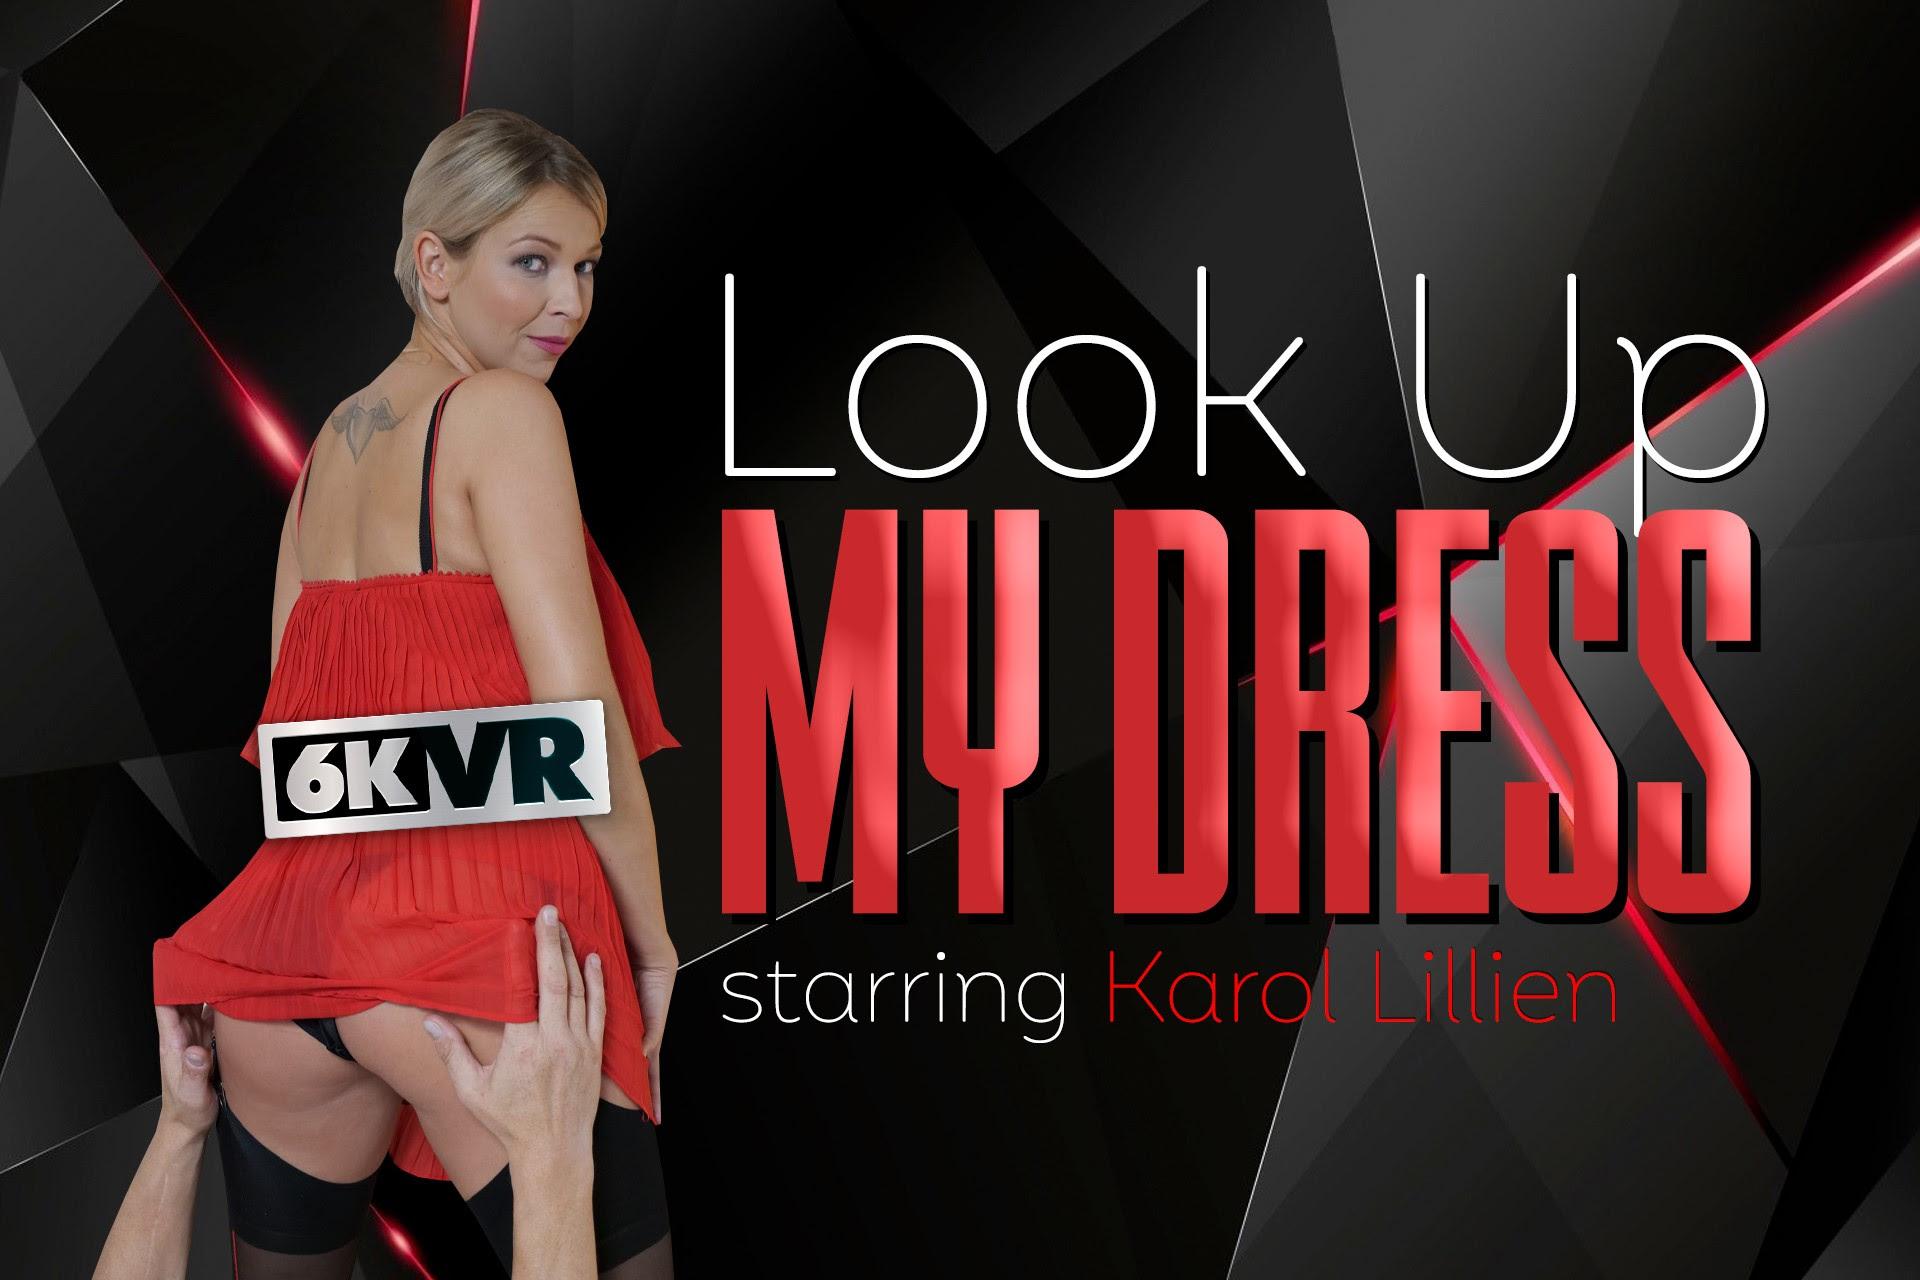 Look Up My Dress